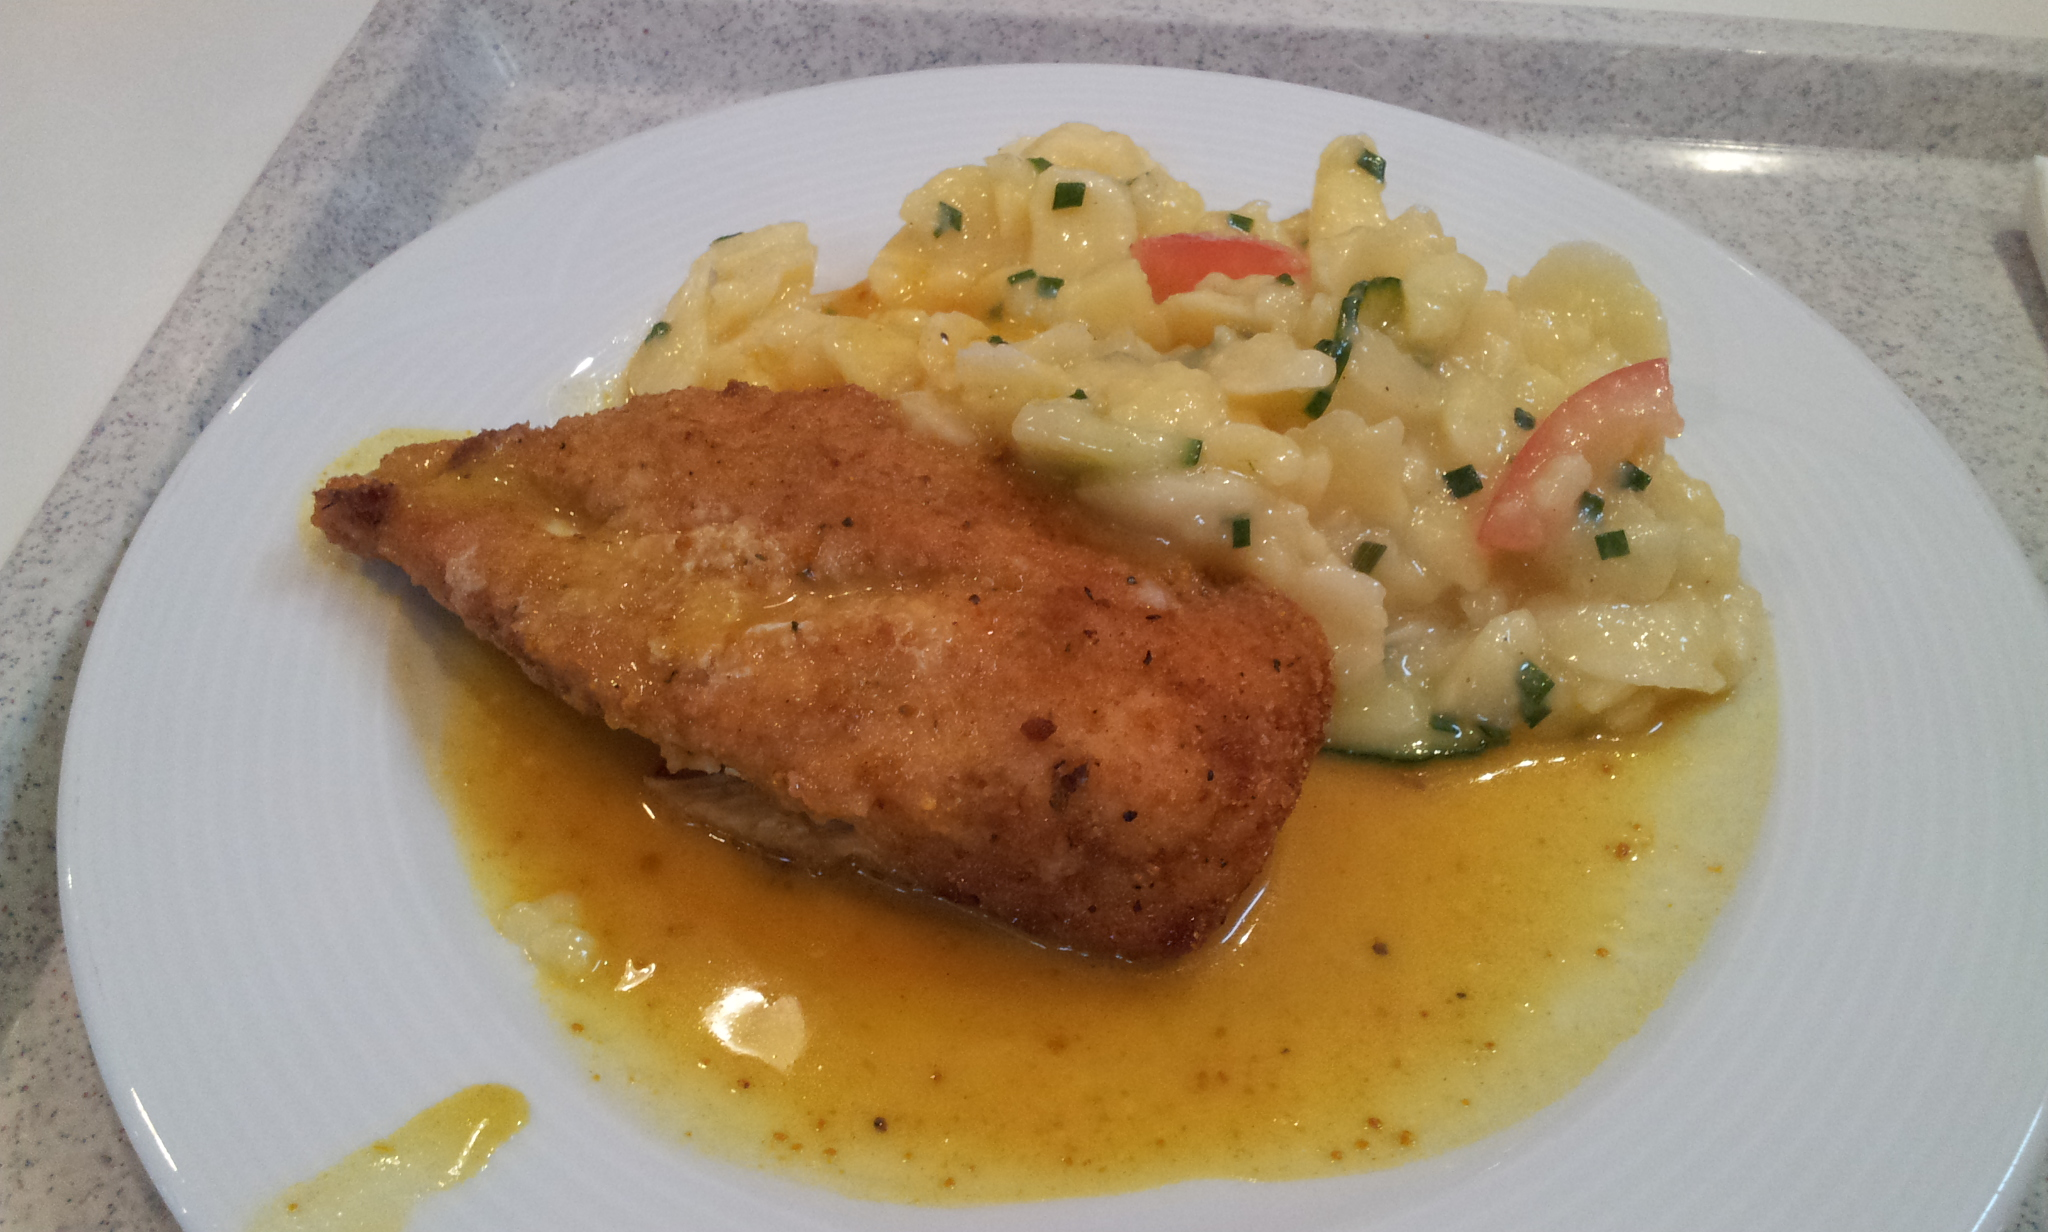 http://foodloader.net/Holz_2013-10-28_Haehnchenbrust_mit_Kartoffel-Cocktail.jpg